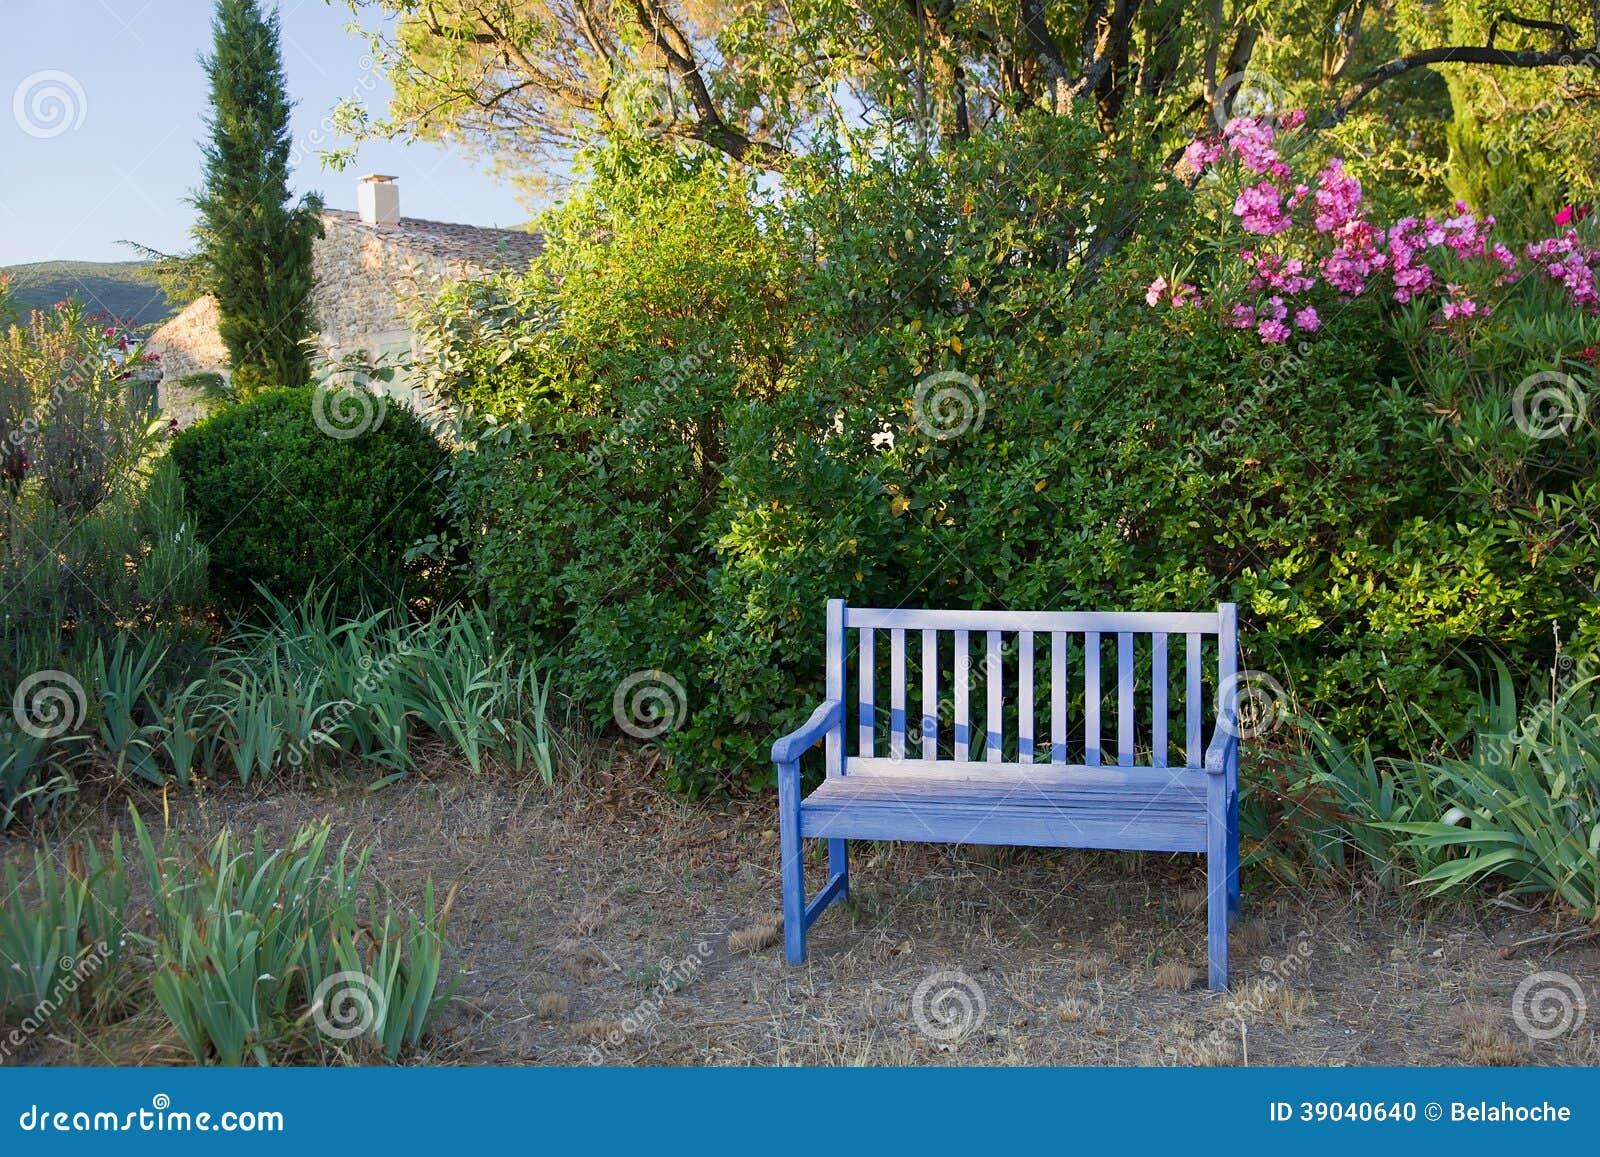 le bleu a peint le banc en bois de jardin provence france photo stock image du r sidence. Black Bedroom Furniture Sets. Home Design Ideas